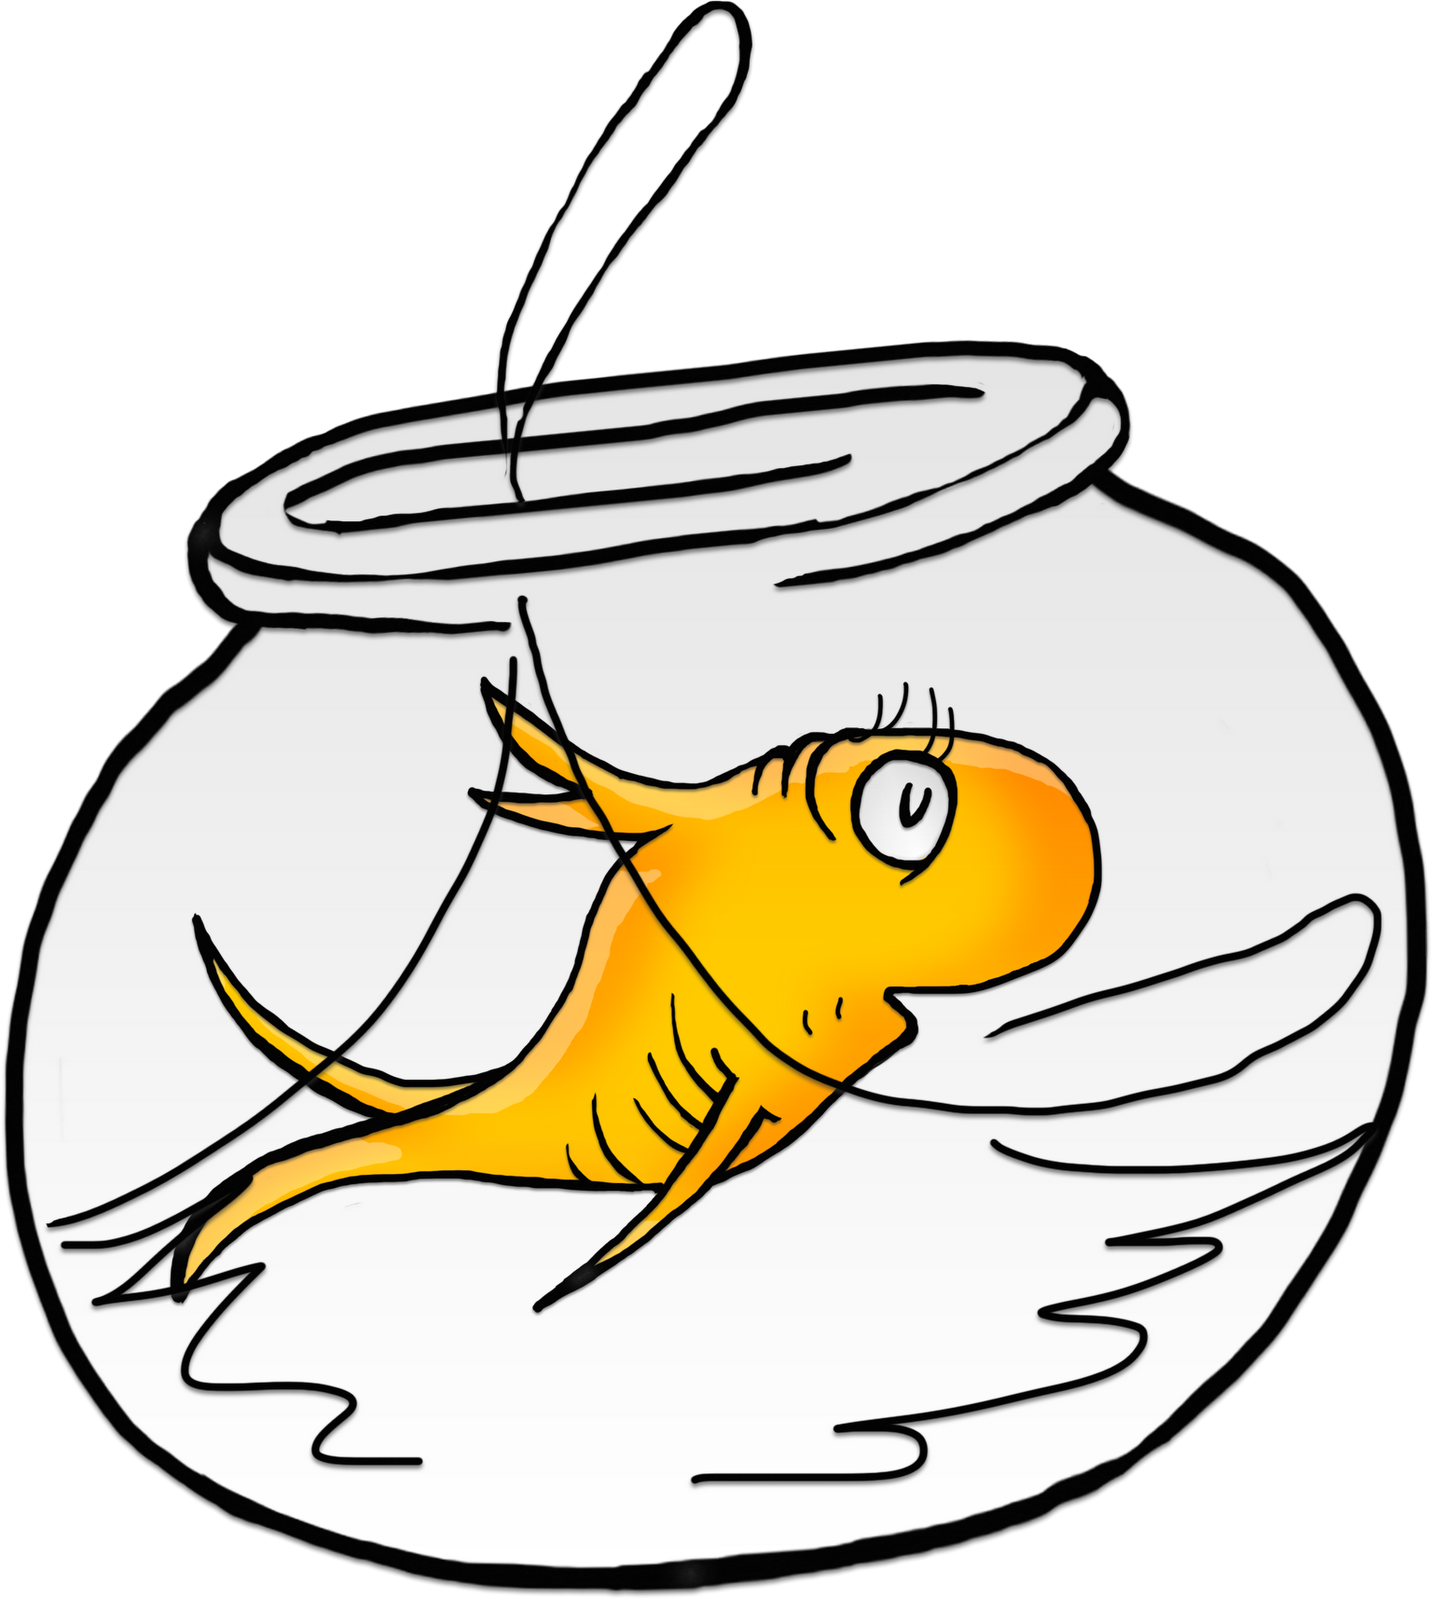 Dr seuss pink fish clipart. Bowlwithfish white png pinterest